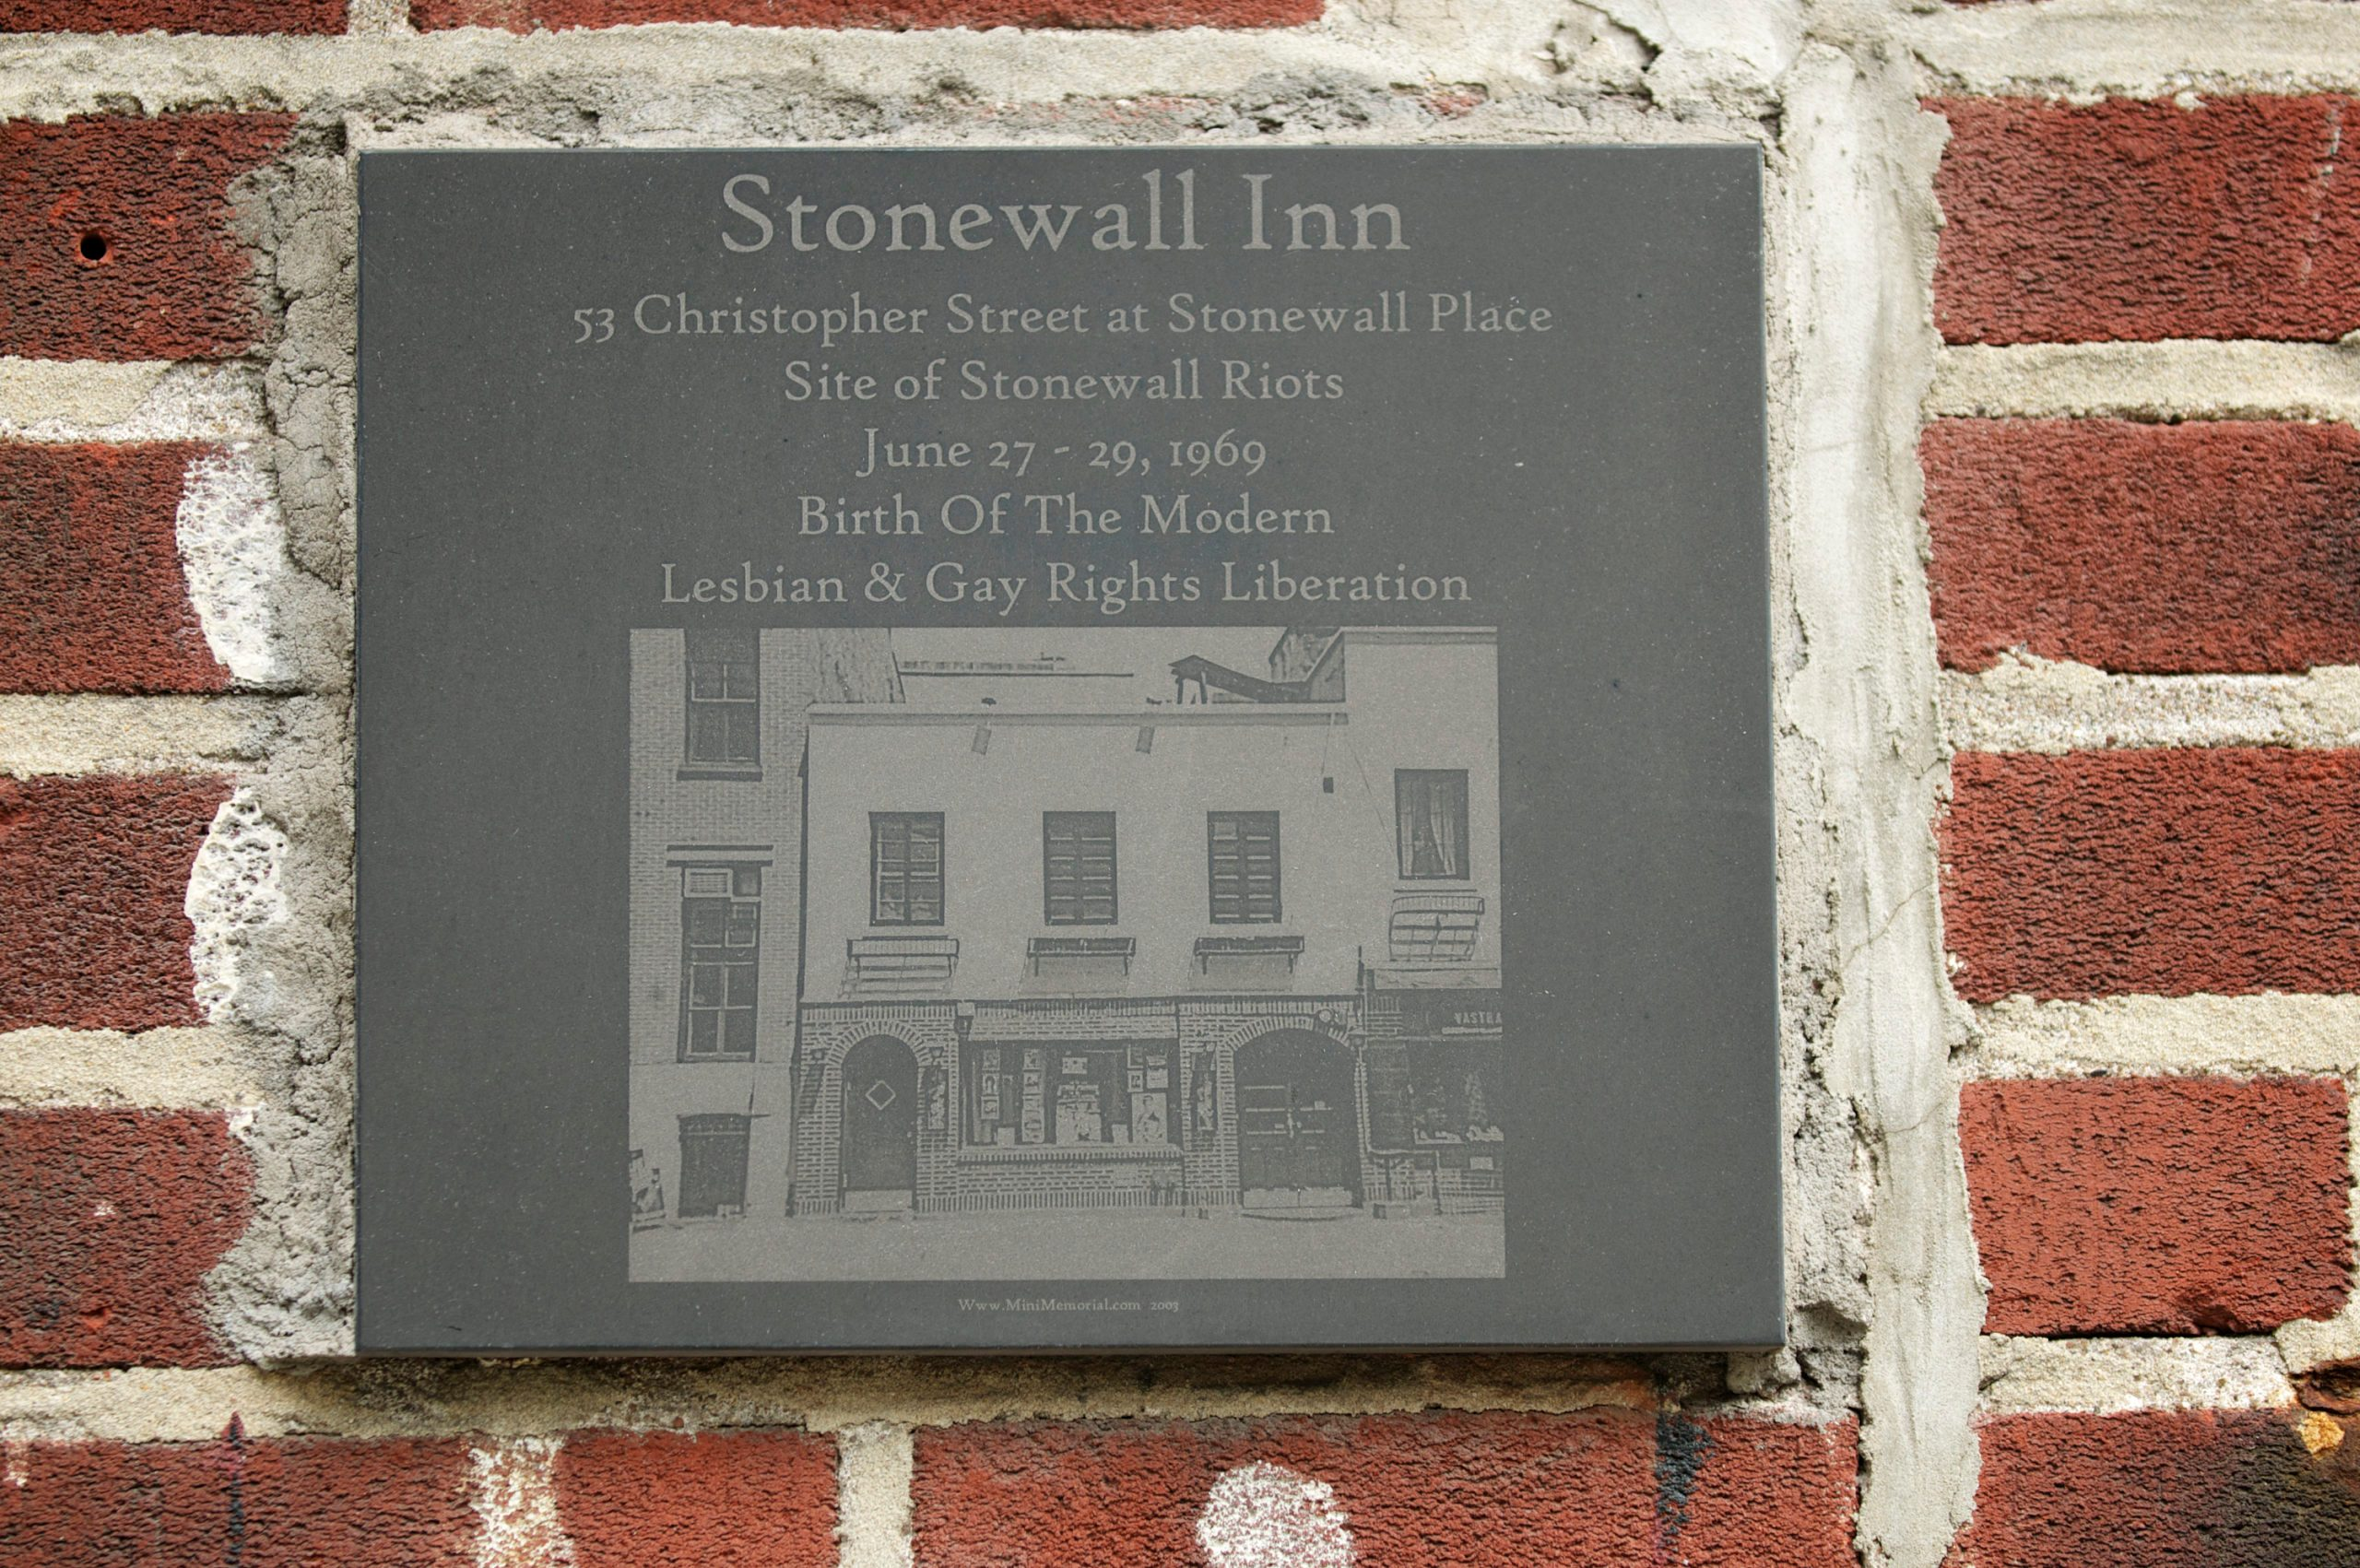 Stonewall Inn Memorial Plaque Close Up